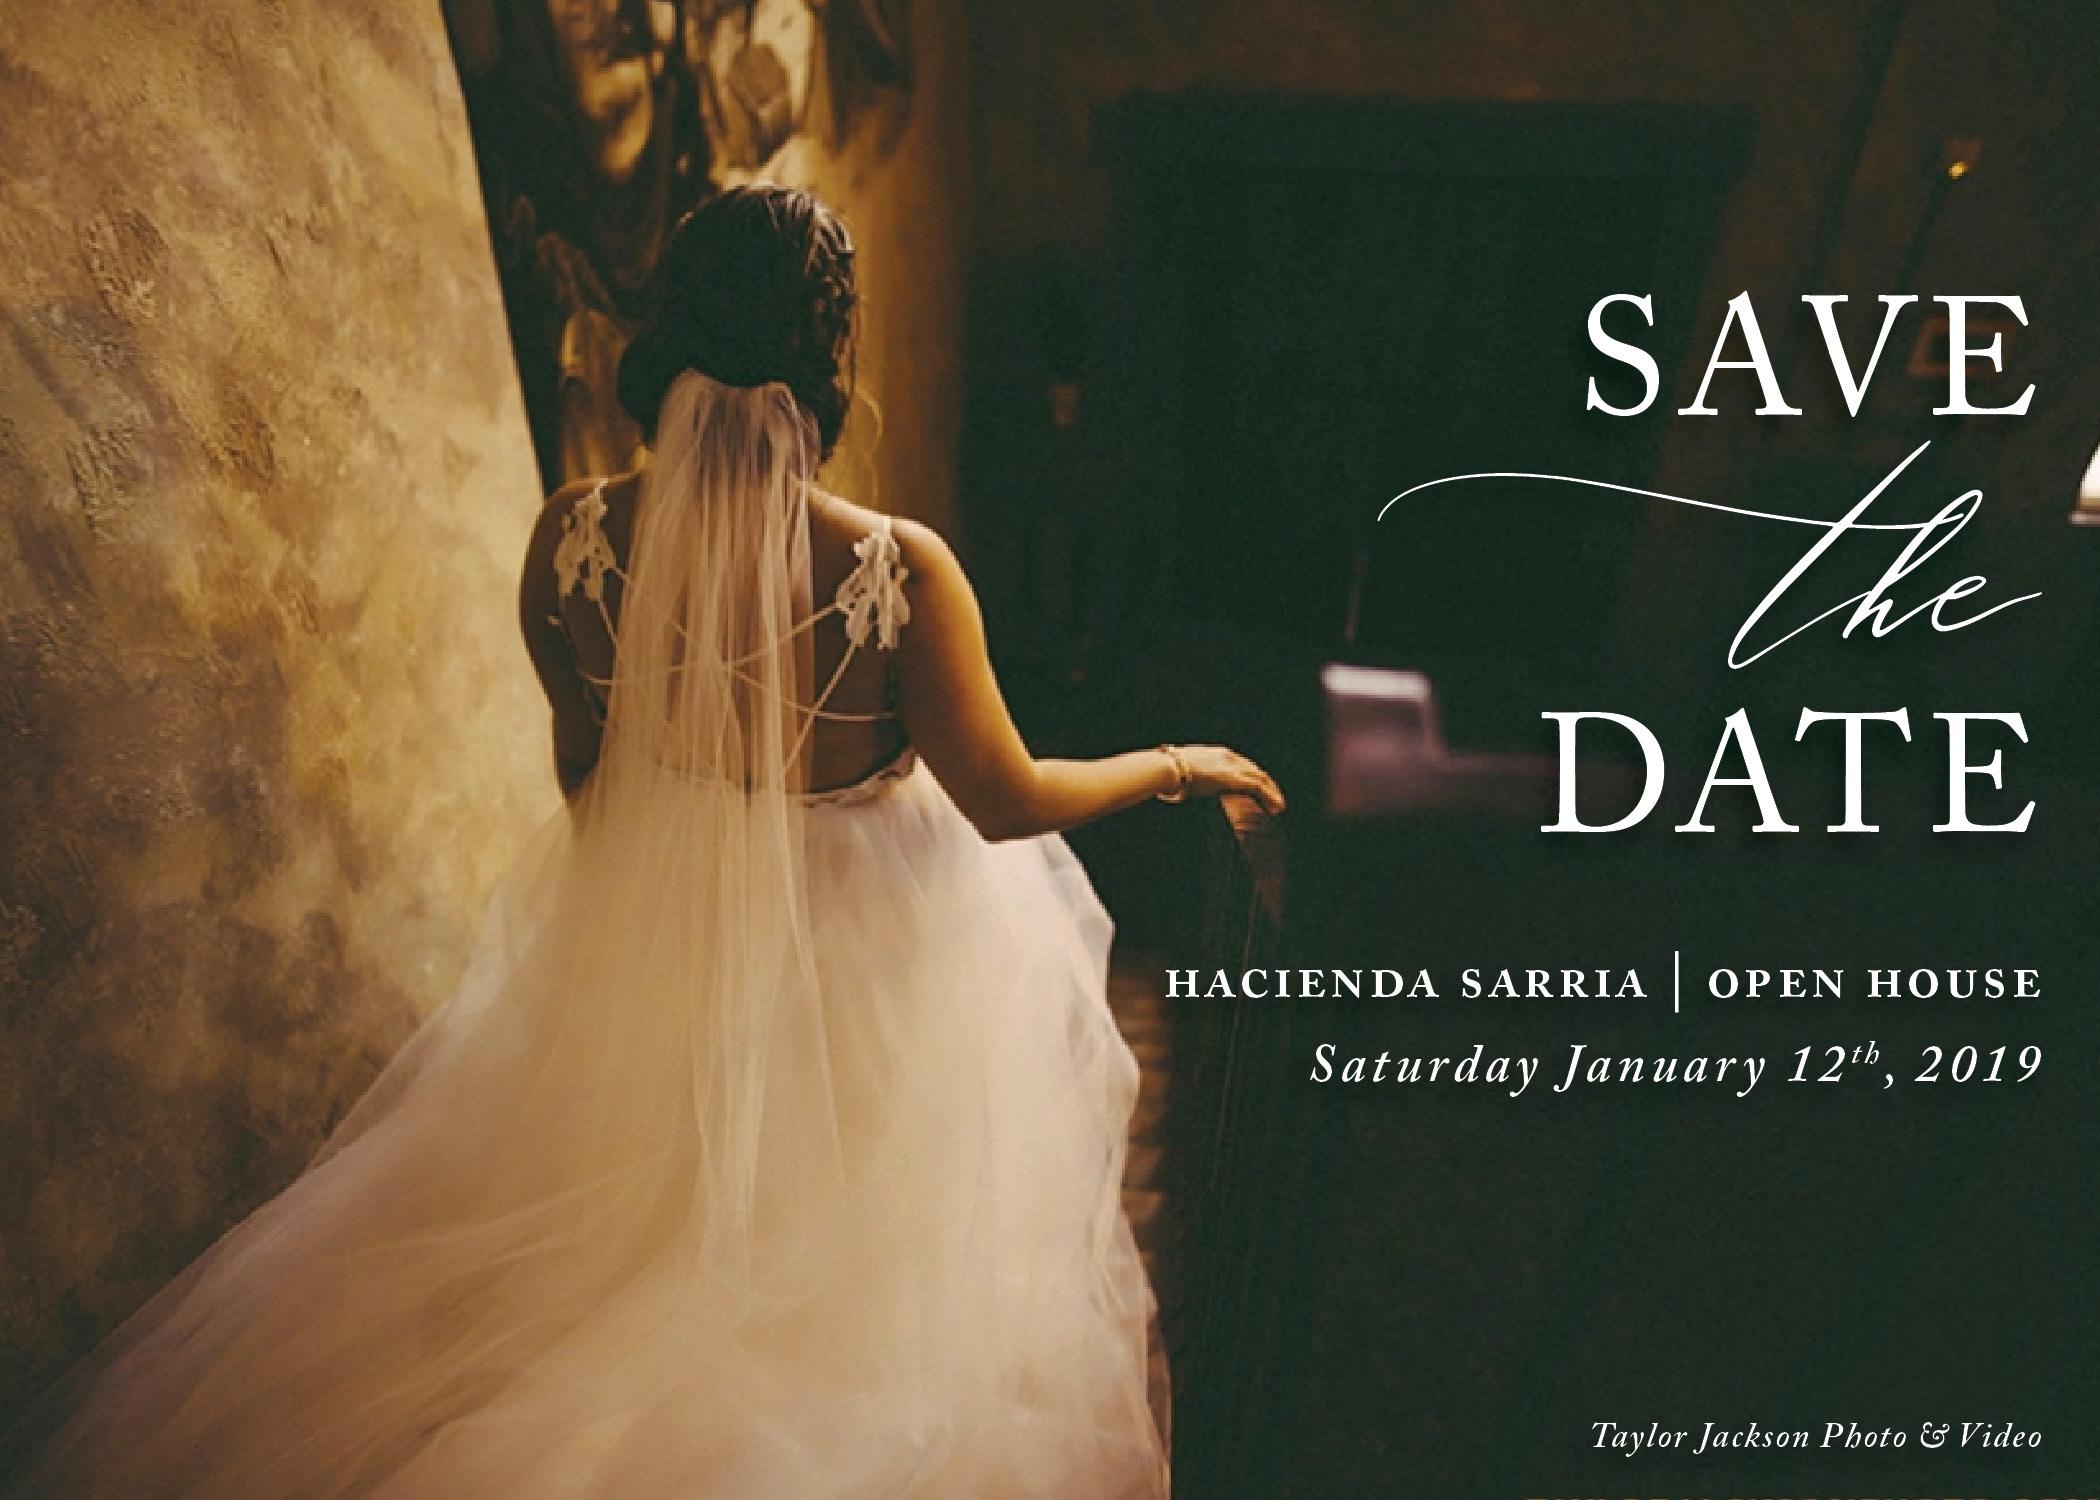 Hacienda Sarria Open House Save The Date